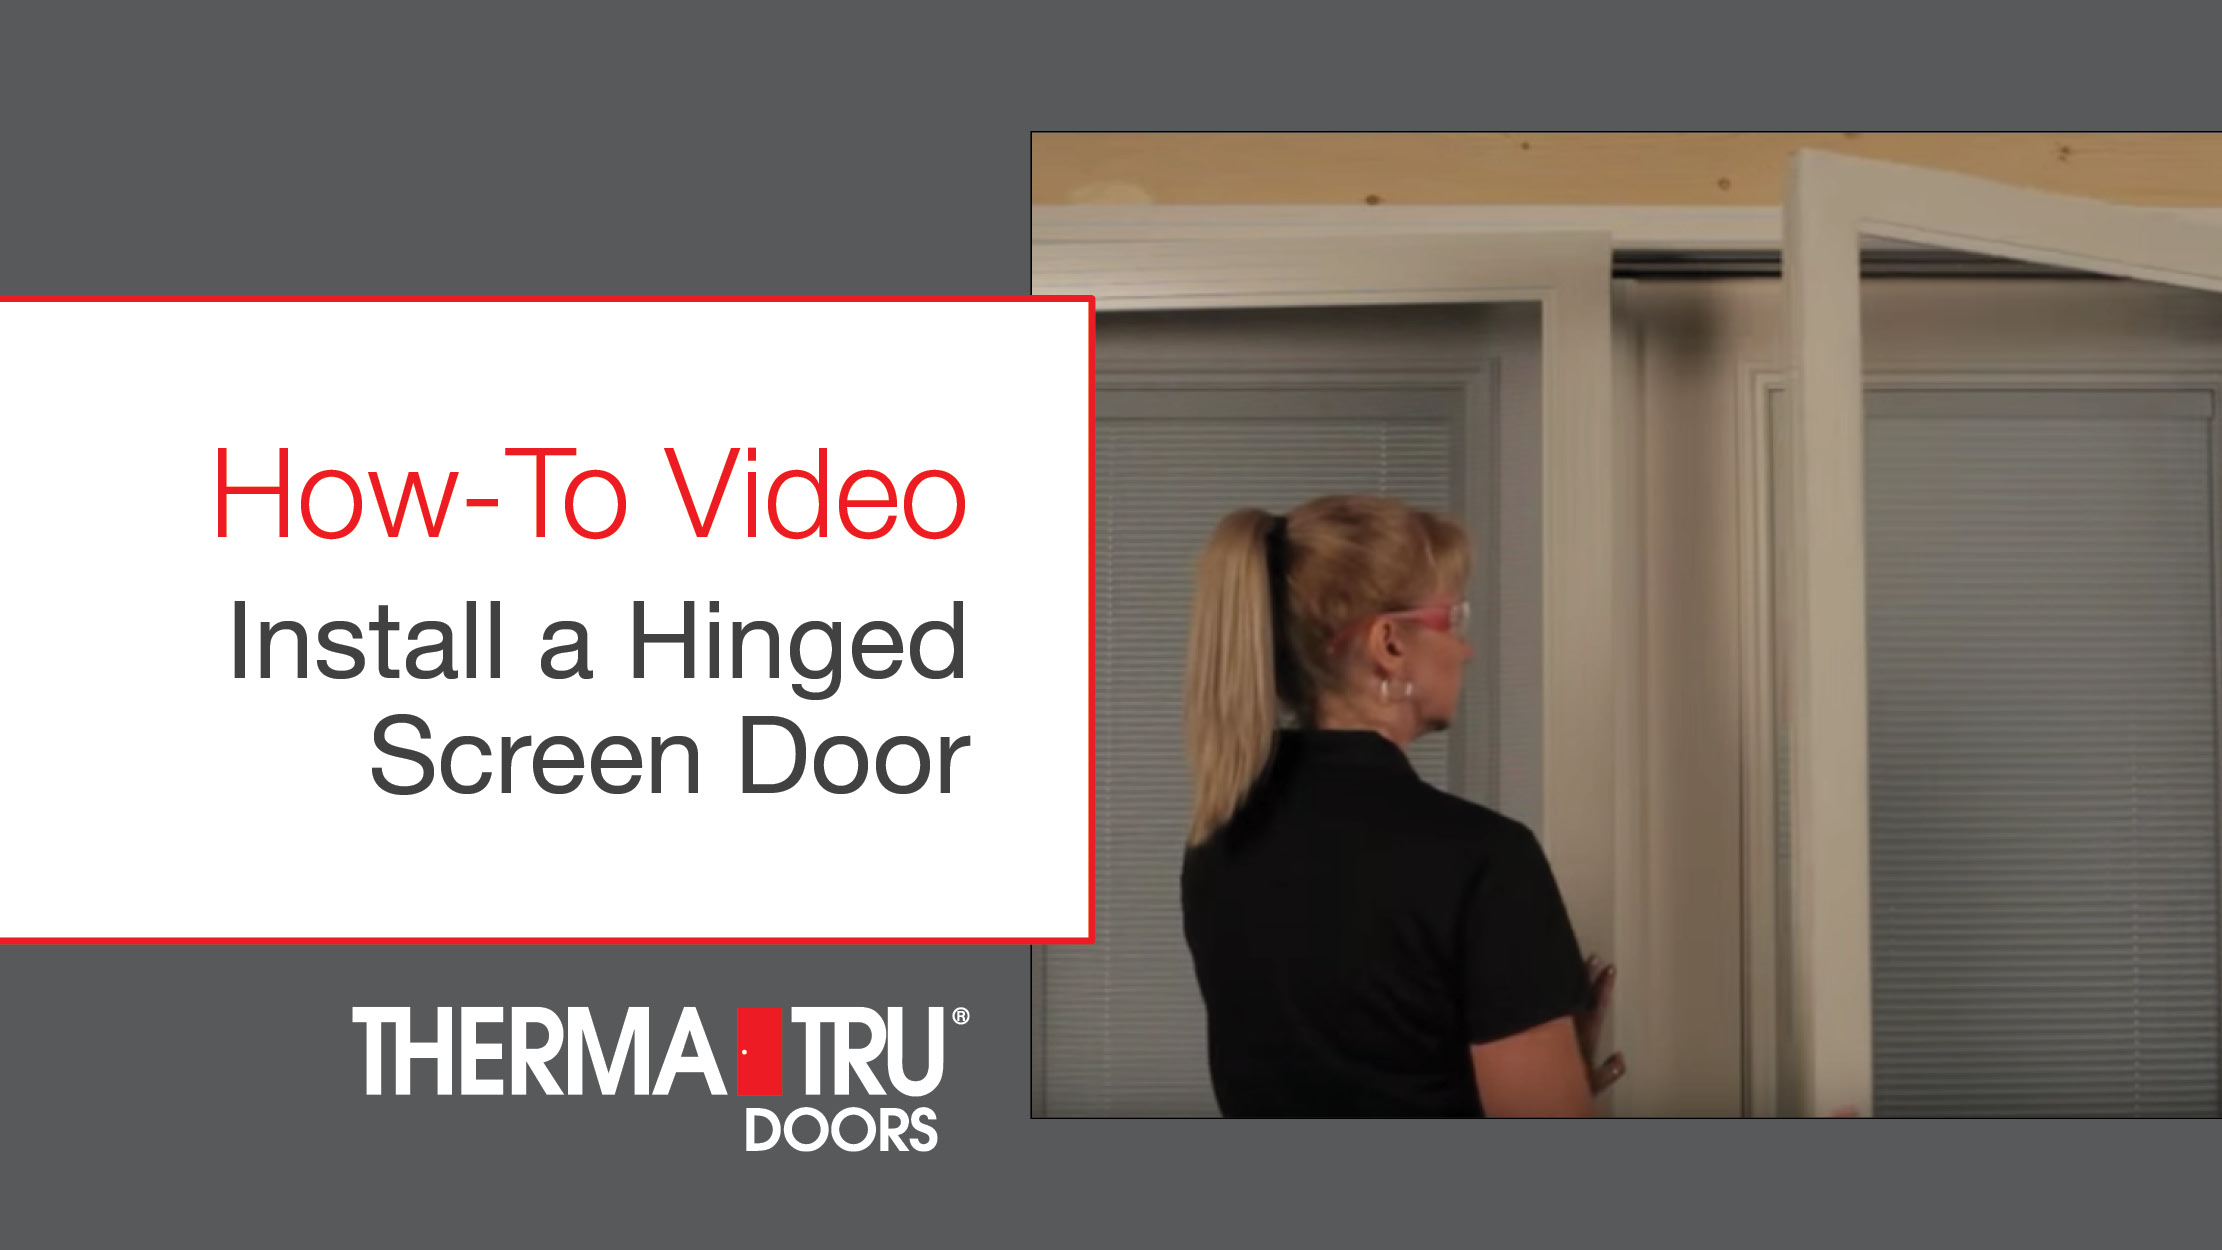 Video Gallery Therma Tru Doors